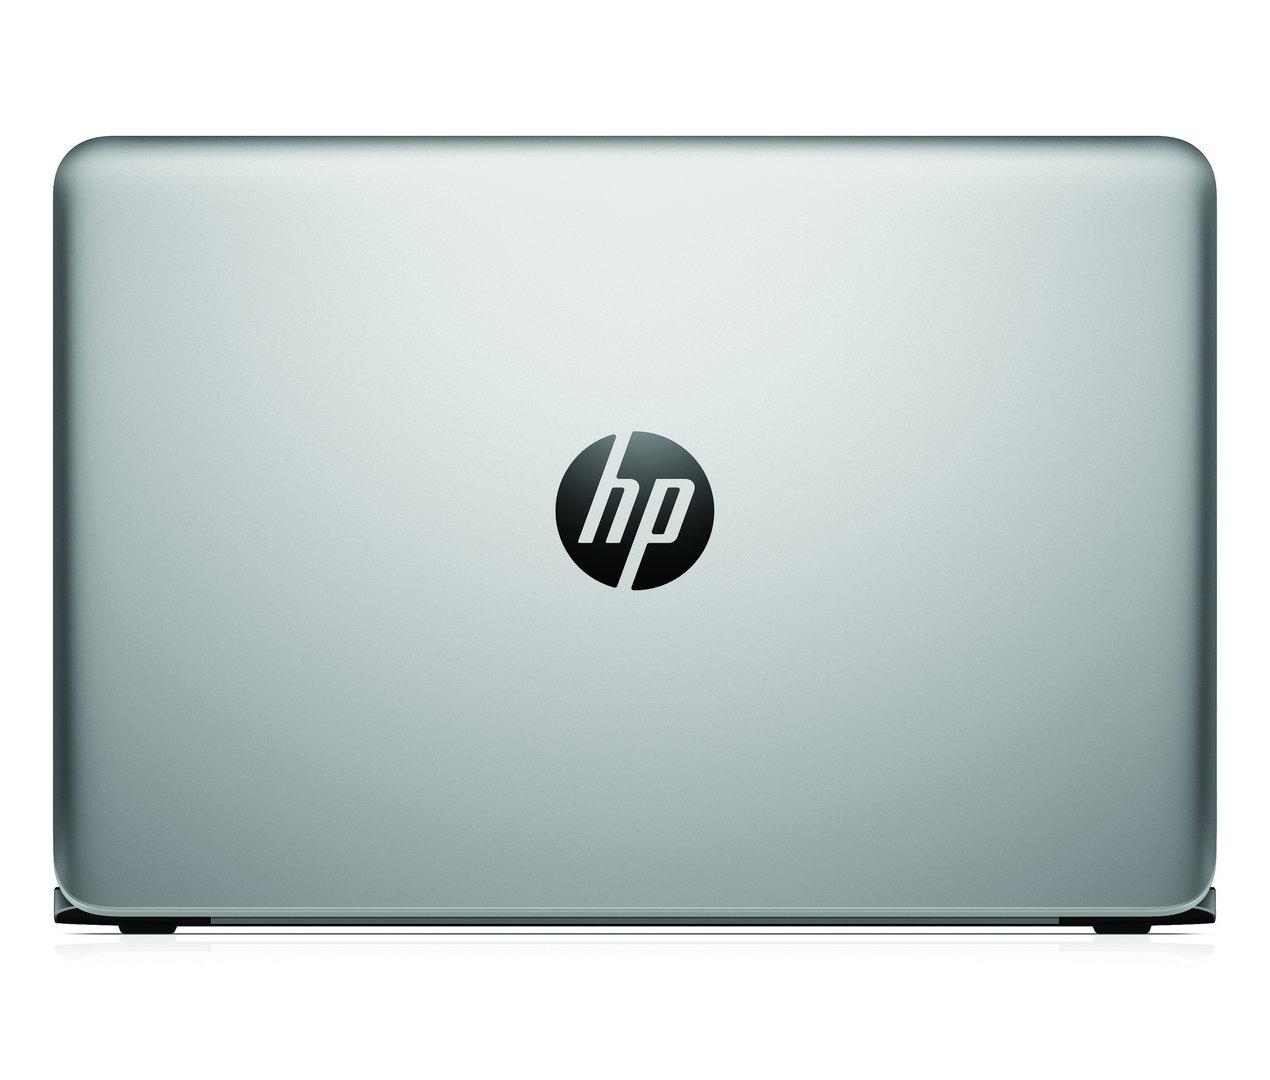 HP Elitebook Folio 1020 SE